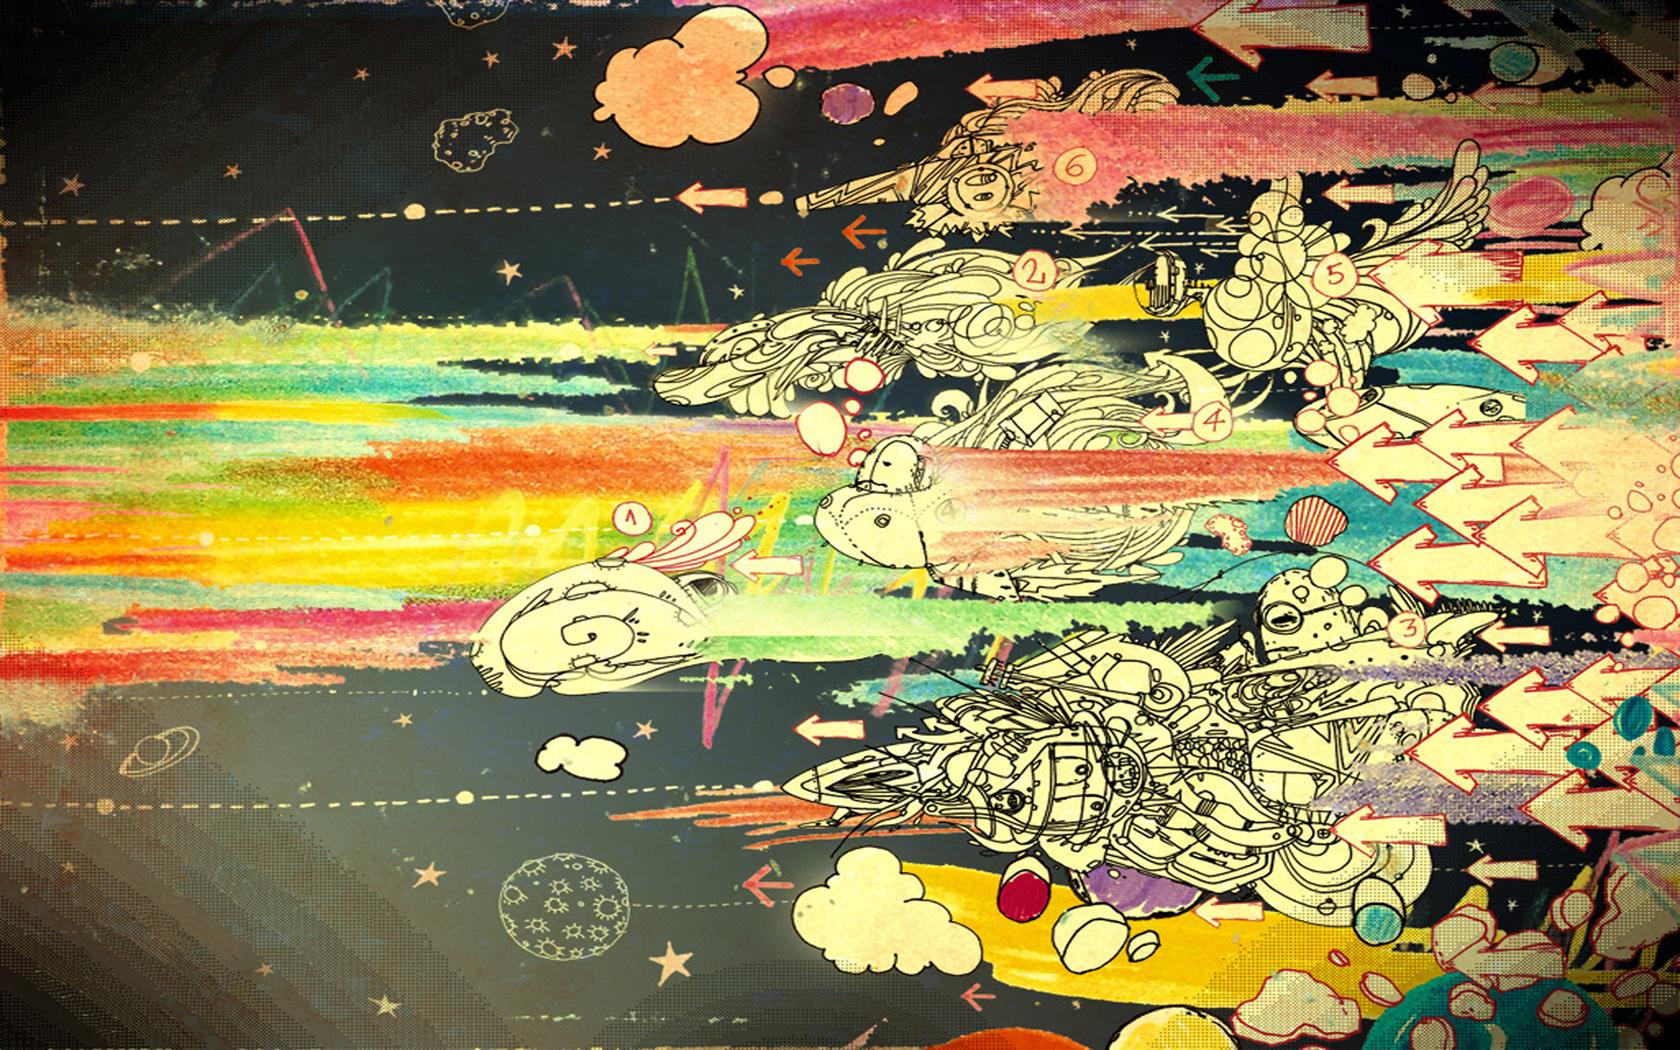 [50+] Doodle Art Wallpapers on WallpaperSafari